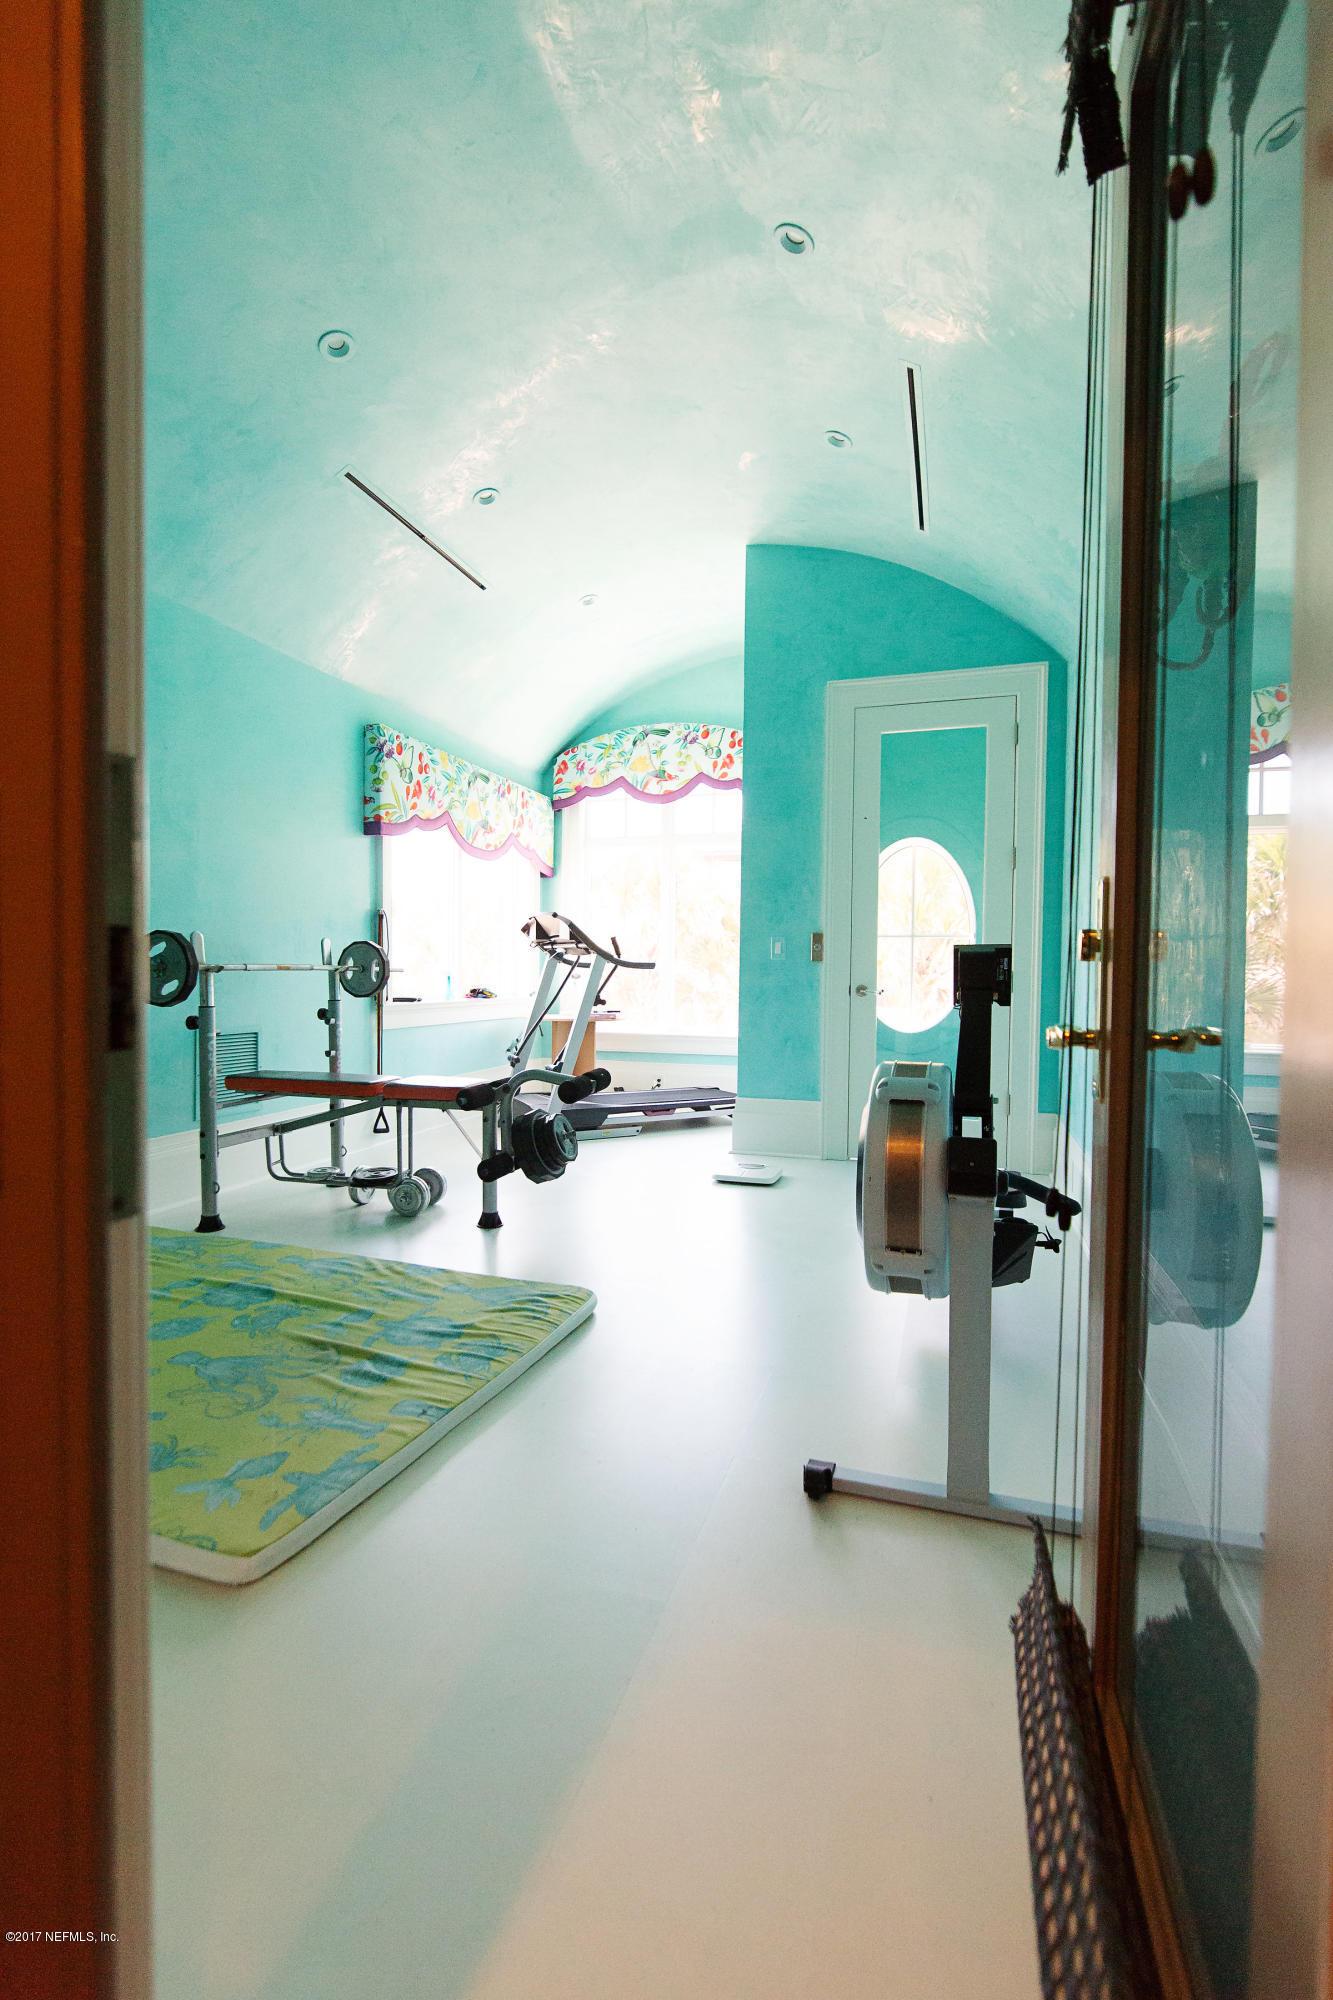 1193 PONTE VEDRA, PONTE VEDRA BEACH, FLORIDA 32082, 5 Bedrooms Bedrooms, ,6 BathroomsBathrooms,Residential - single family,For sale,PONTE VEDRA,931549